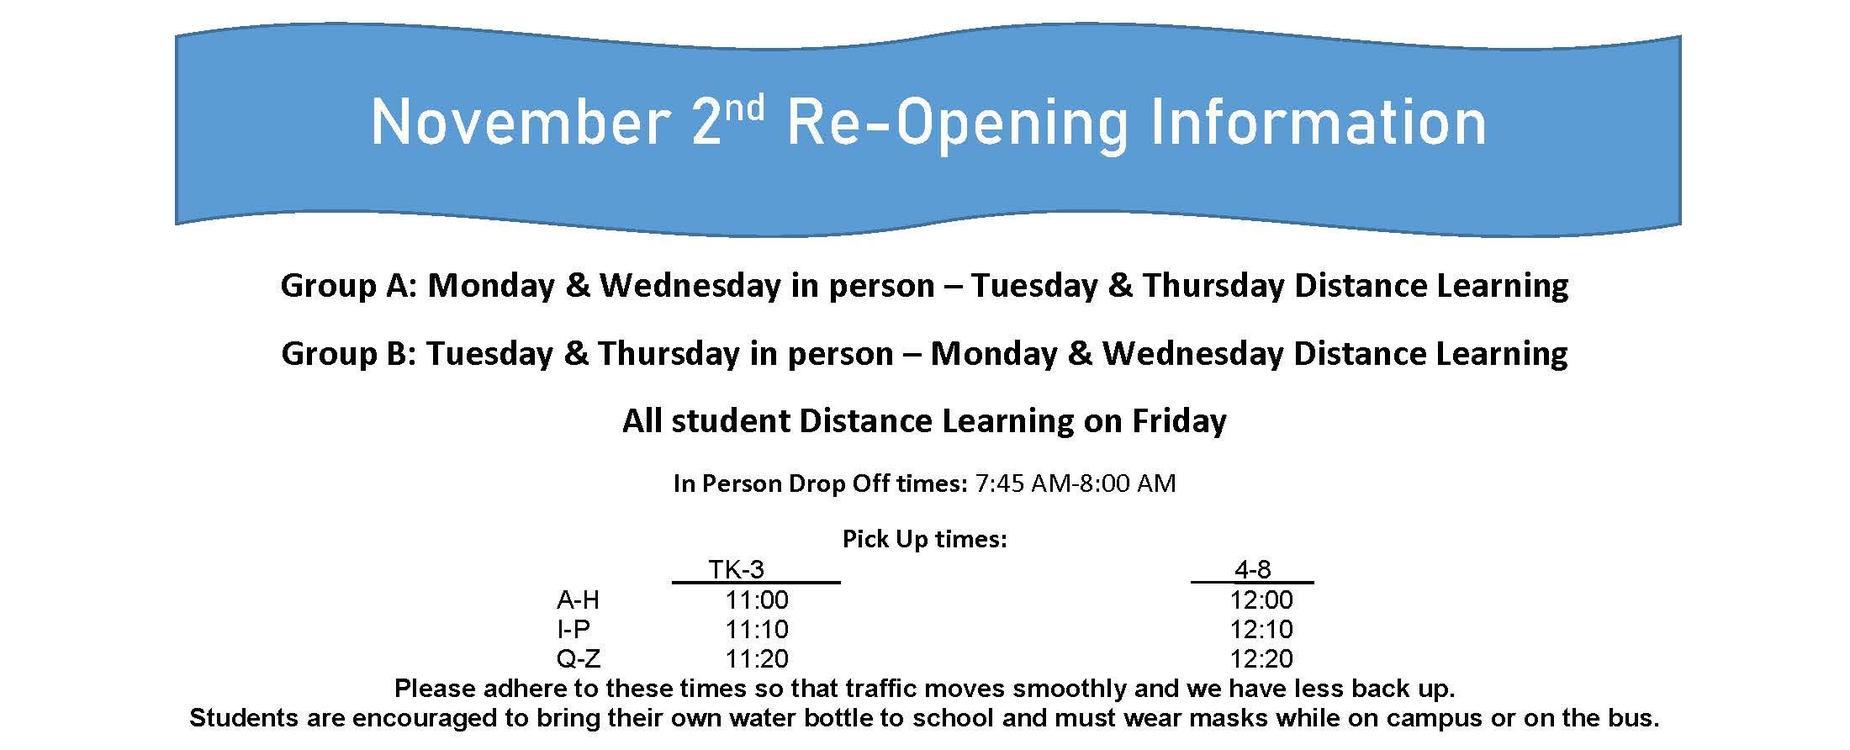 Nov 2 Re-opening information